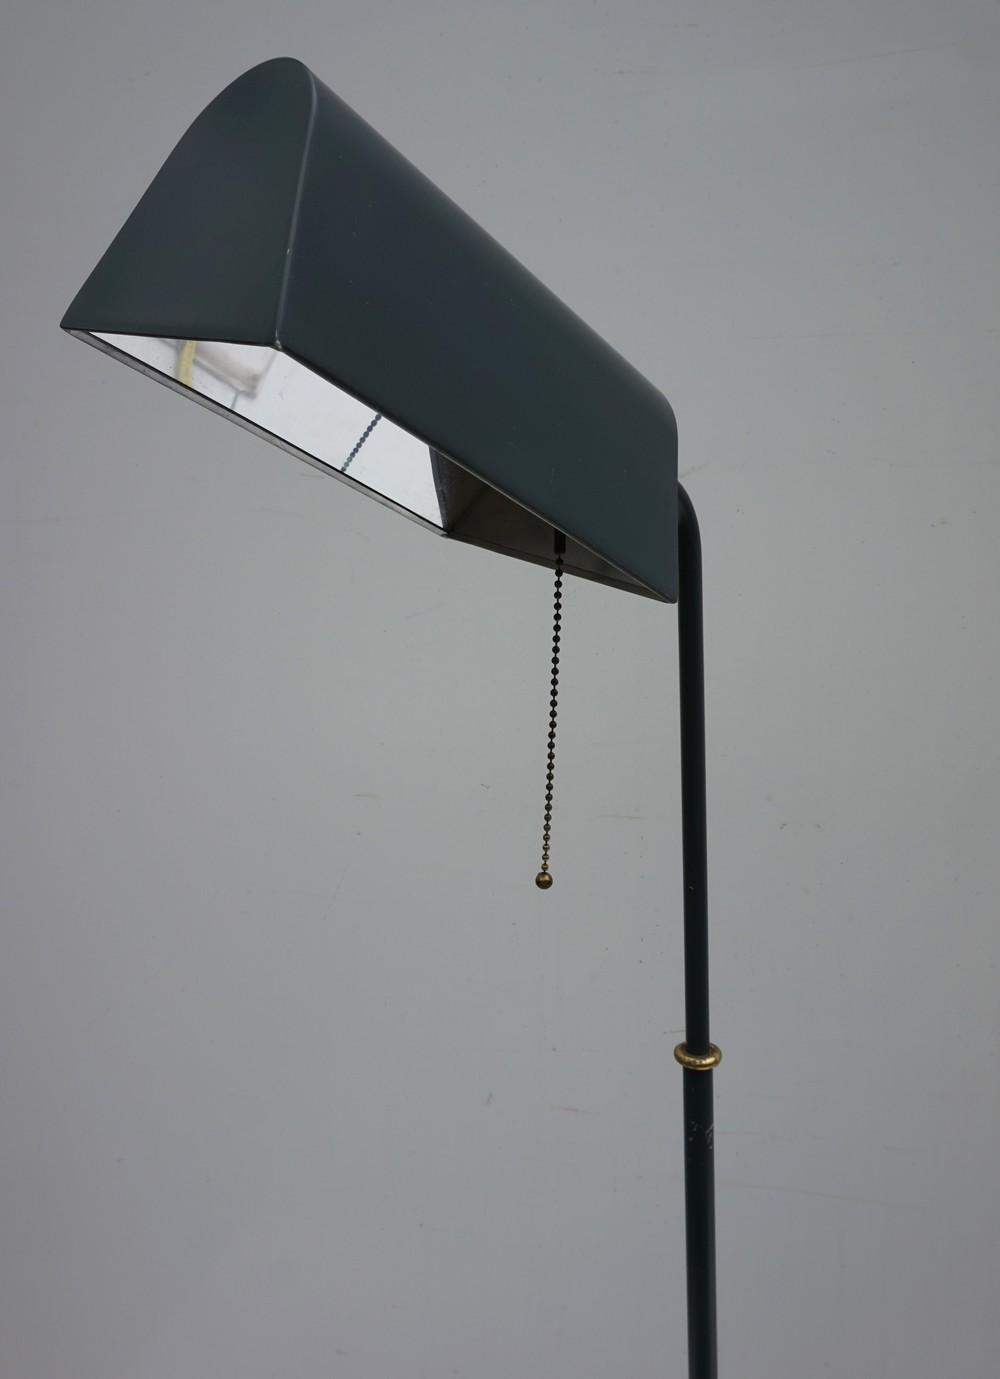 Image of: Vintage Mid Century Modern Koch Lowy Omi Adjustable Pharmacy Floor Lamp